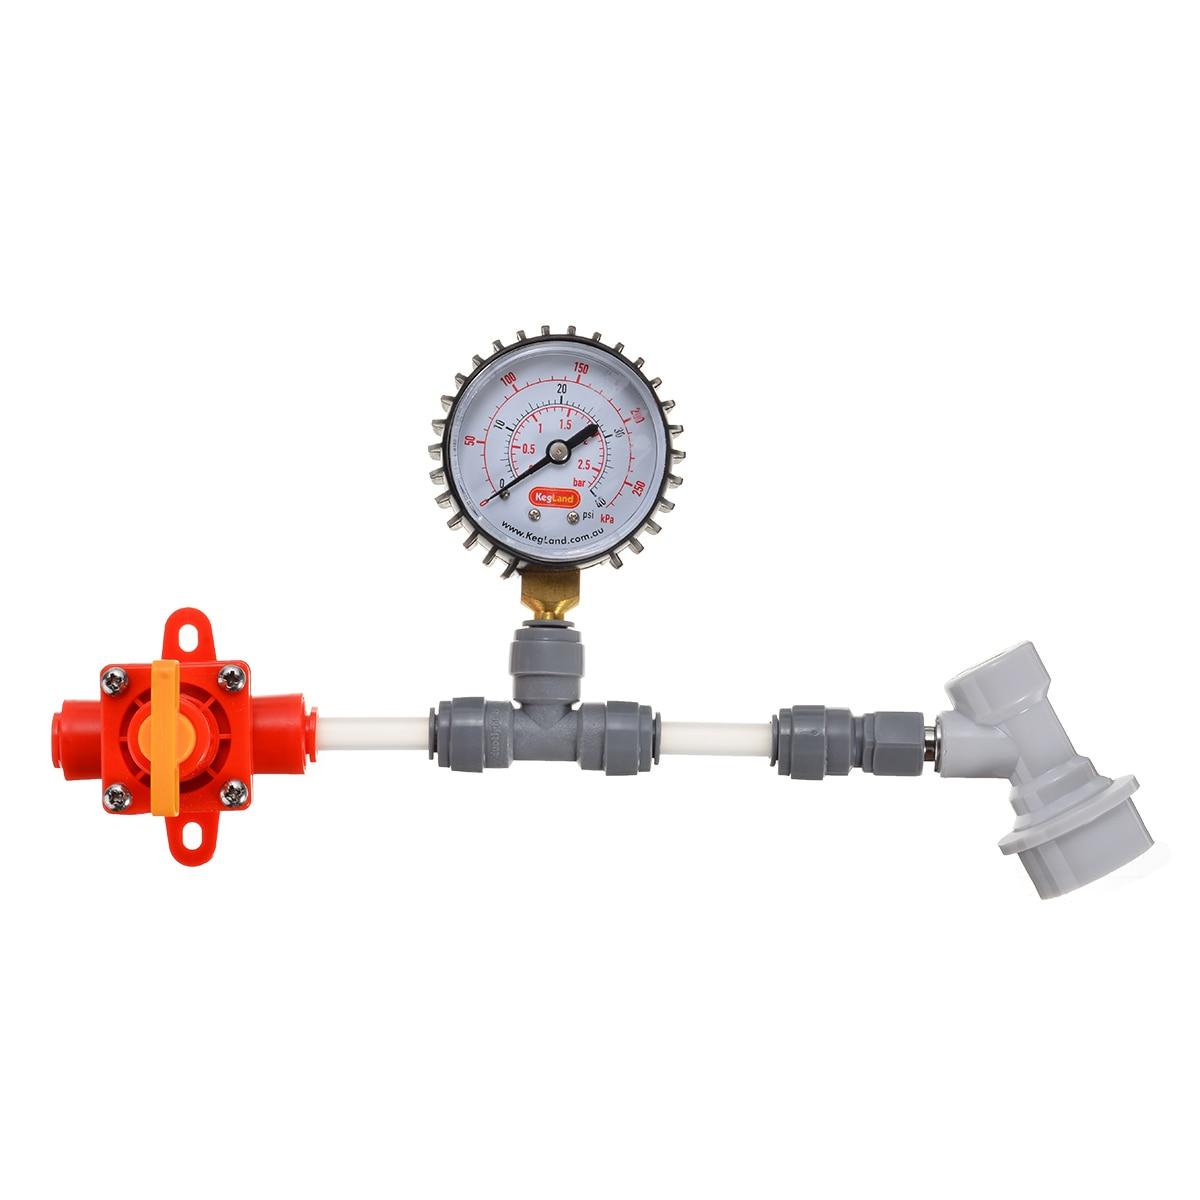 New Blowtie Food Grade Acetal Diaphragm Spunding Valve Set - Adjustable Pressure Relief Gauge Ball 0-40 Psi